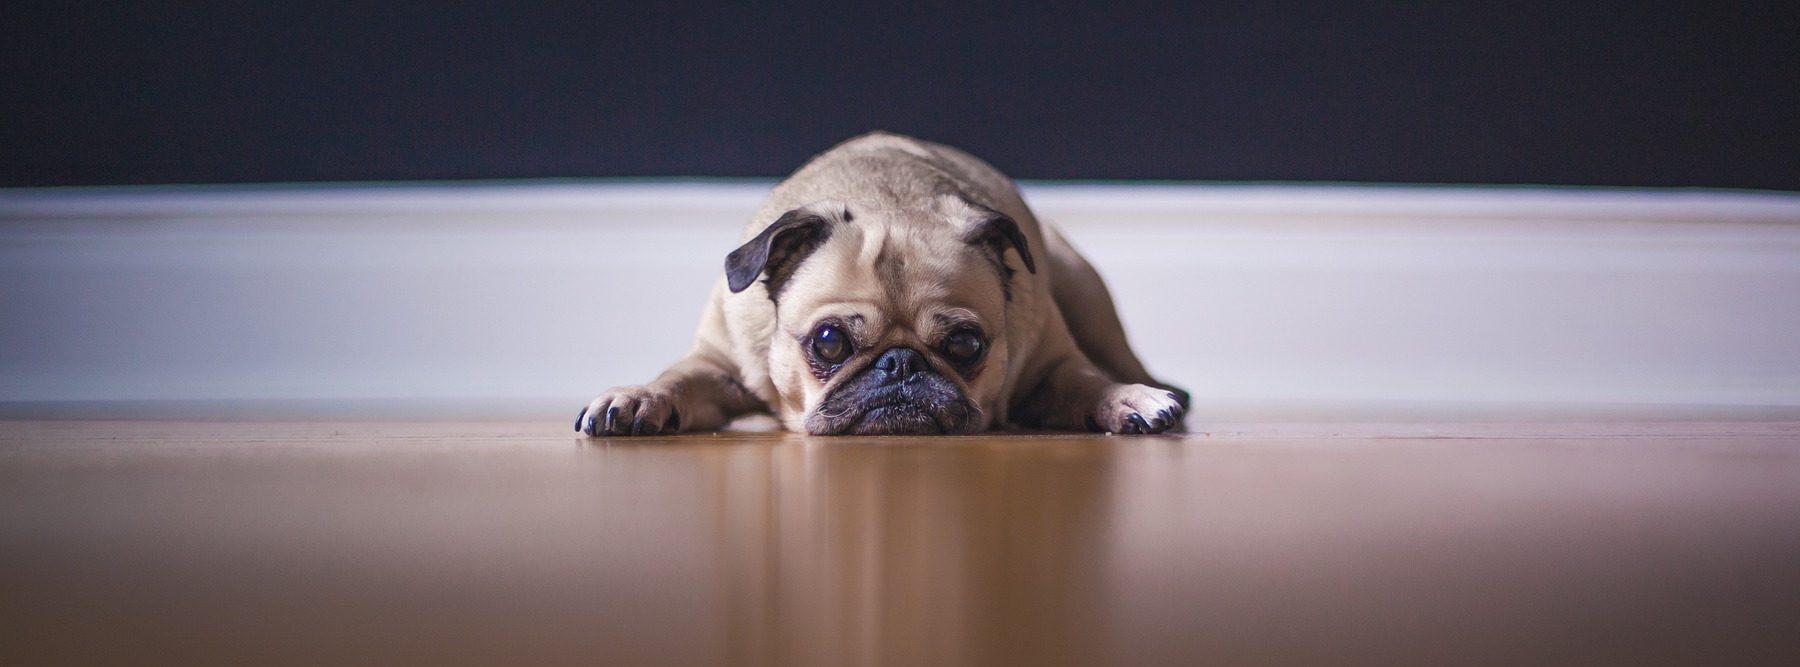 Tener un perro mejora tu salud